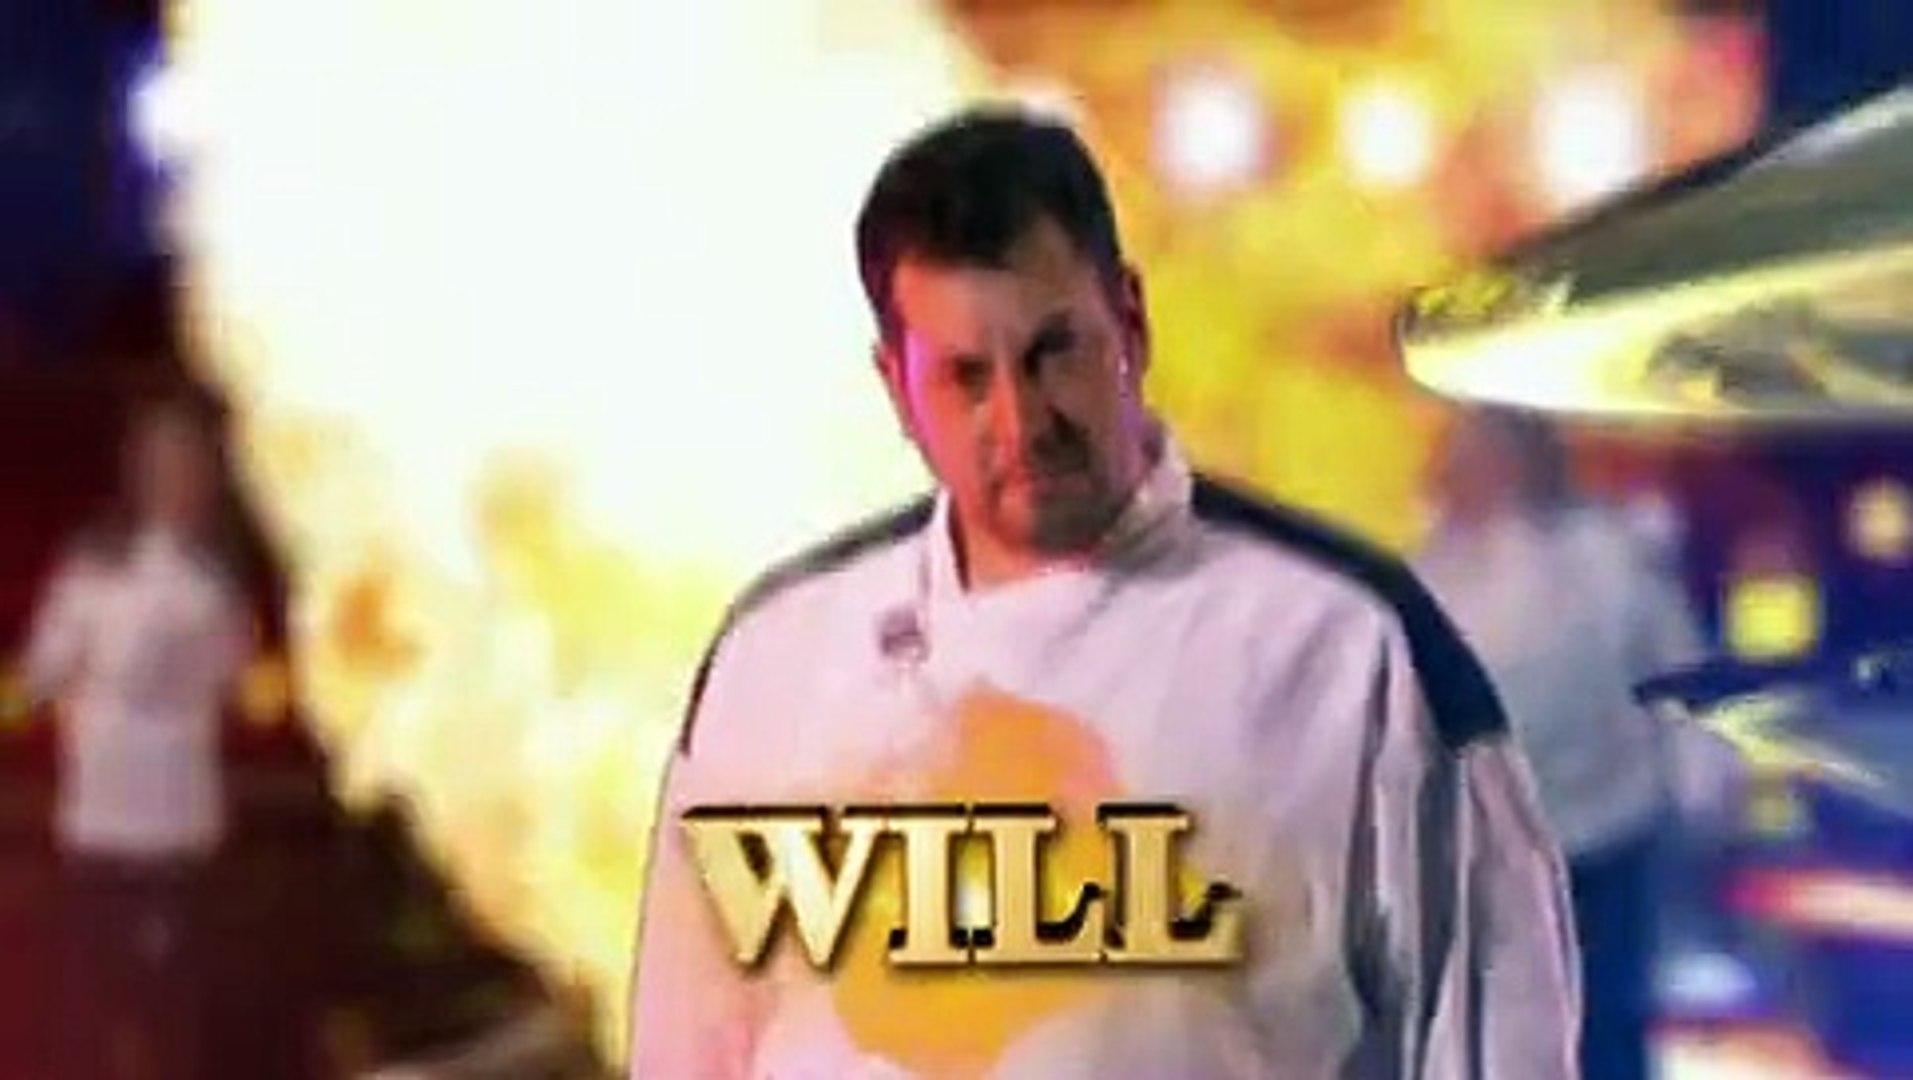 Hell S Kitchen S09e16 Winner Chosen